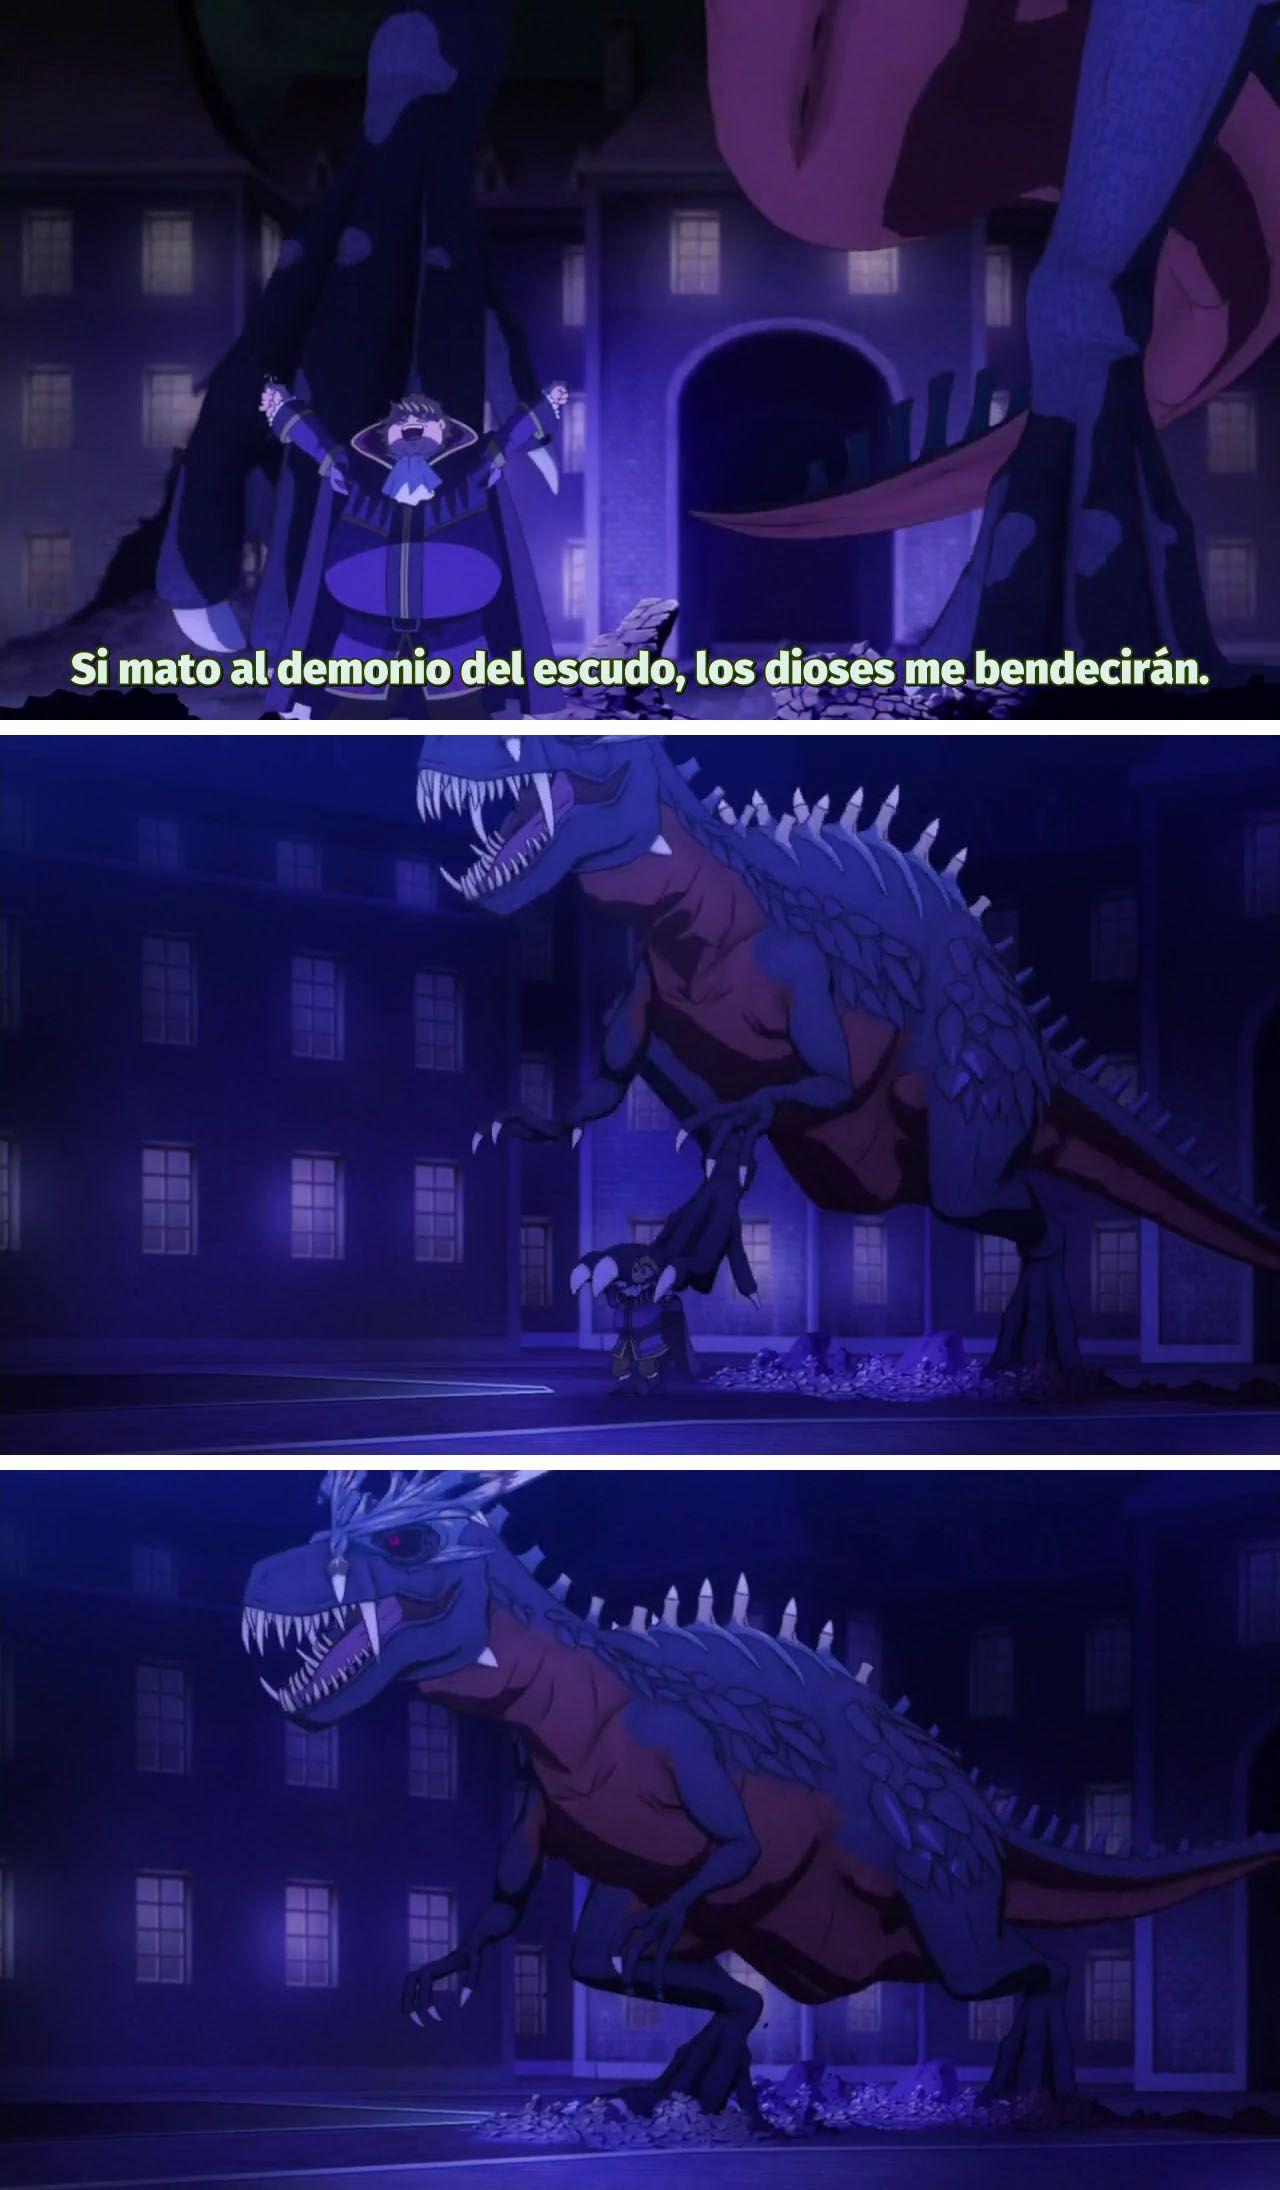 Pin de Jurgen Andrade en Meme Anime español Español